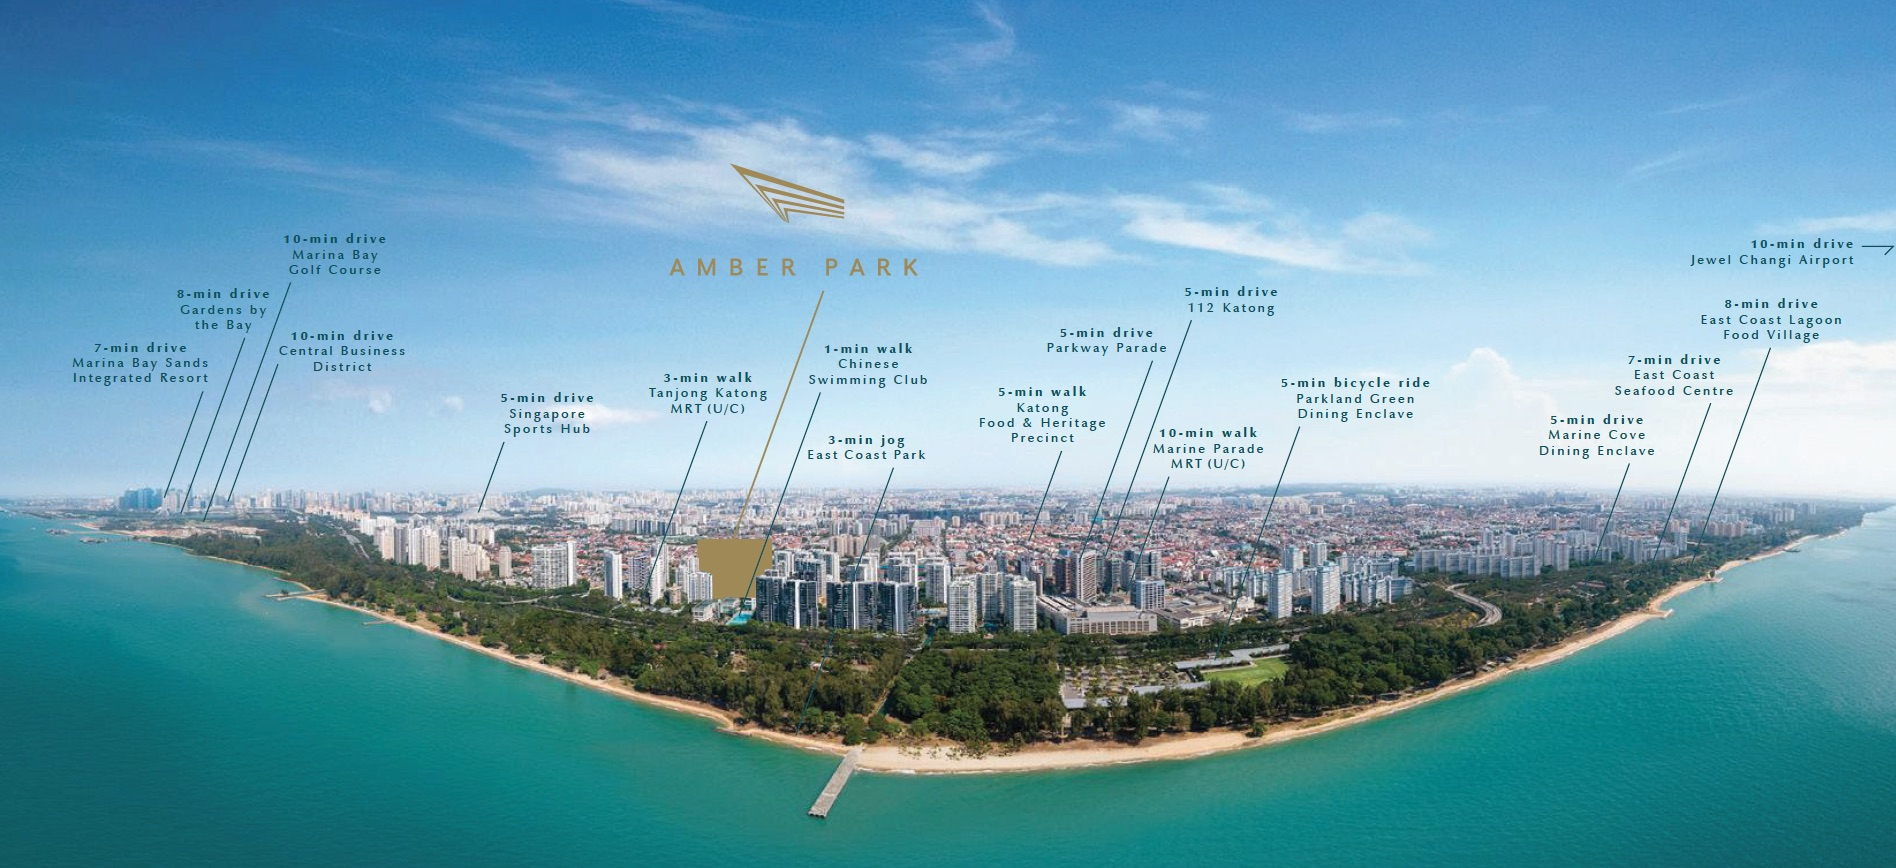 Amber Park amenities